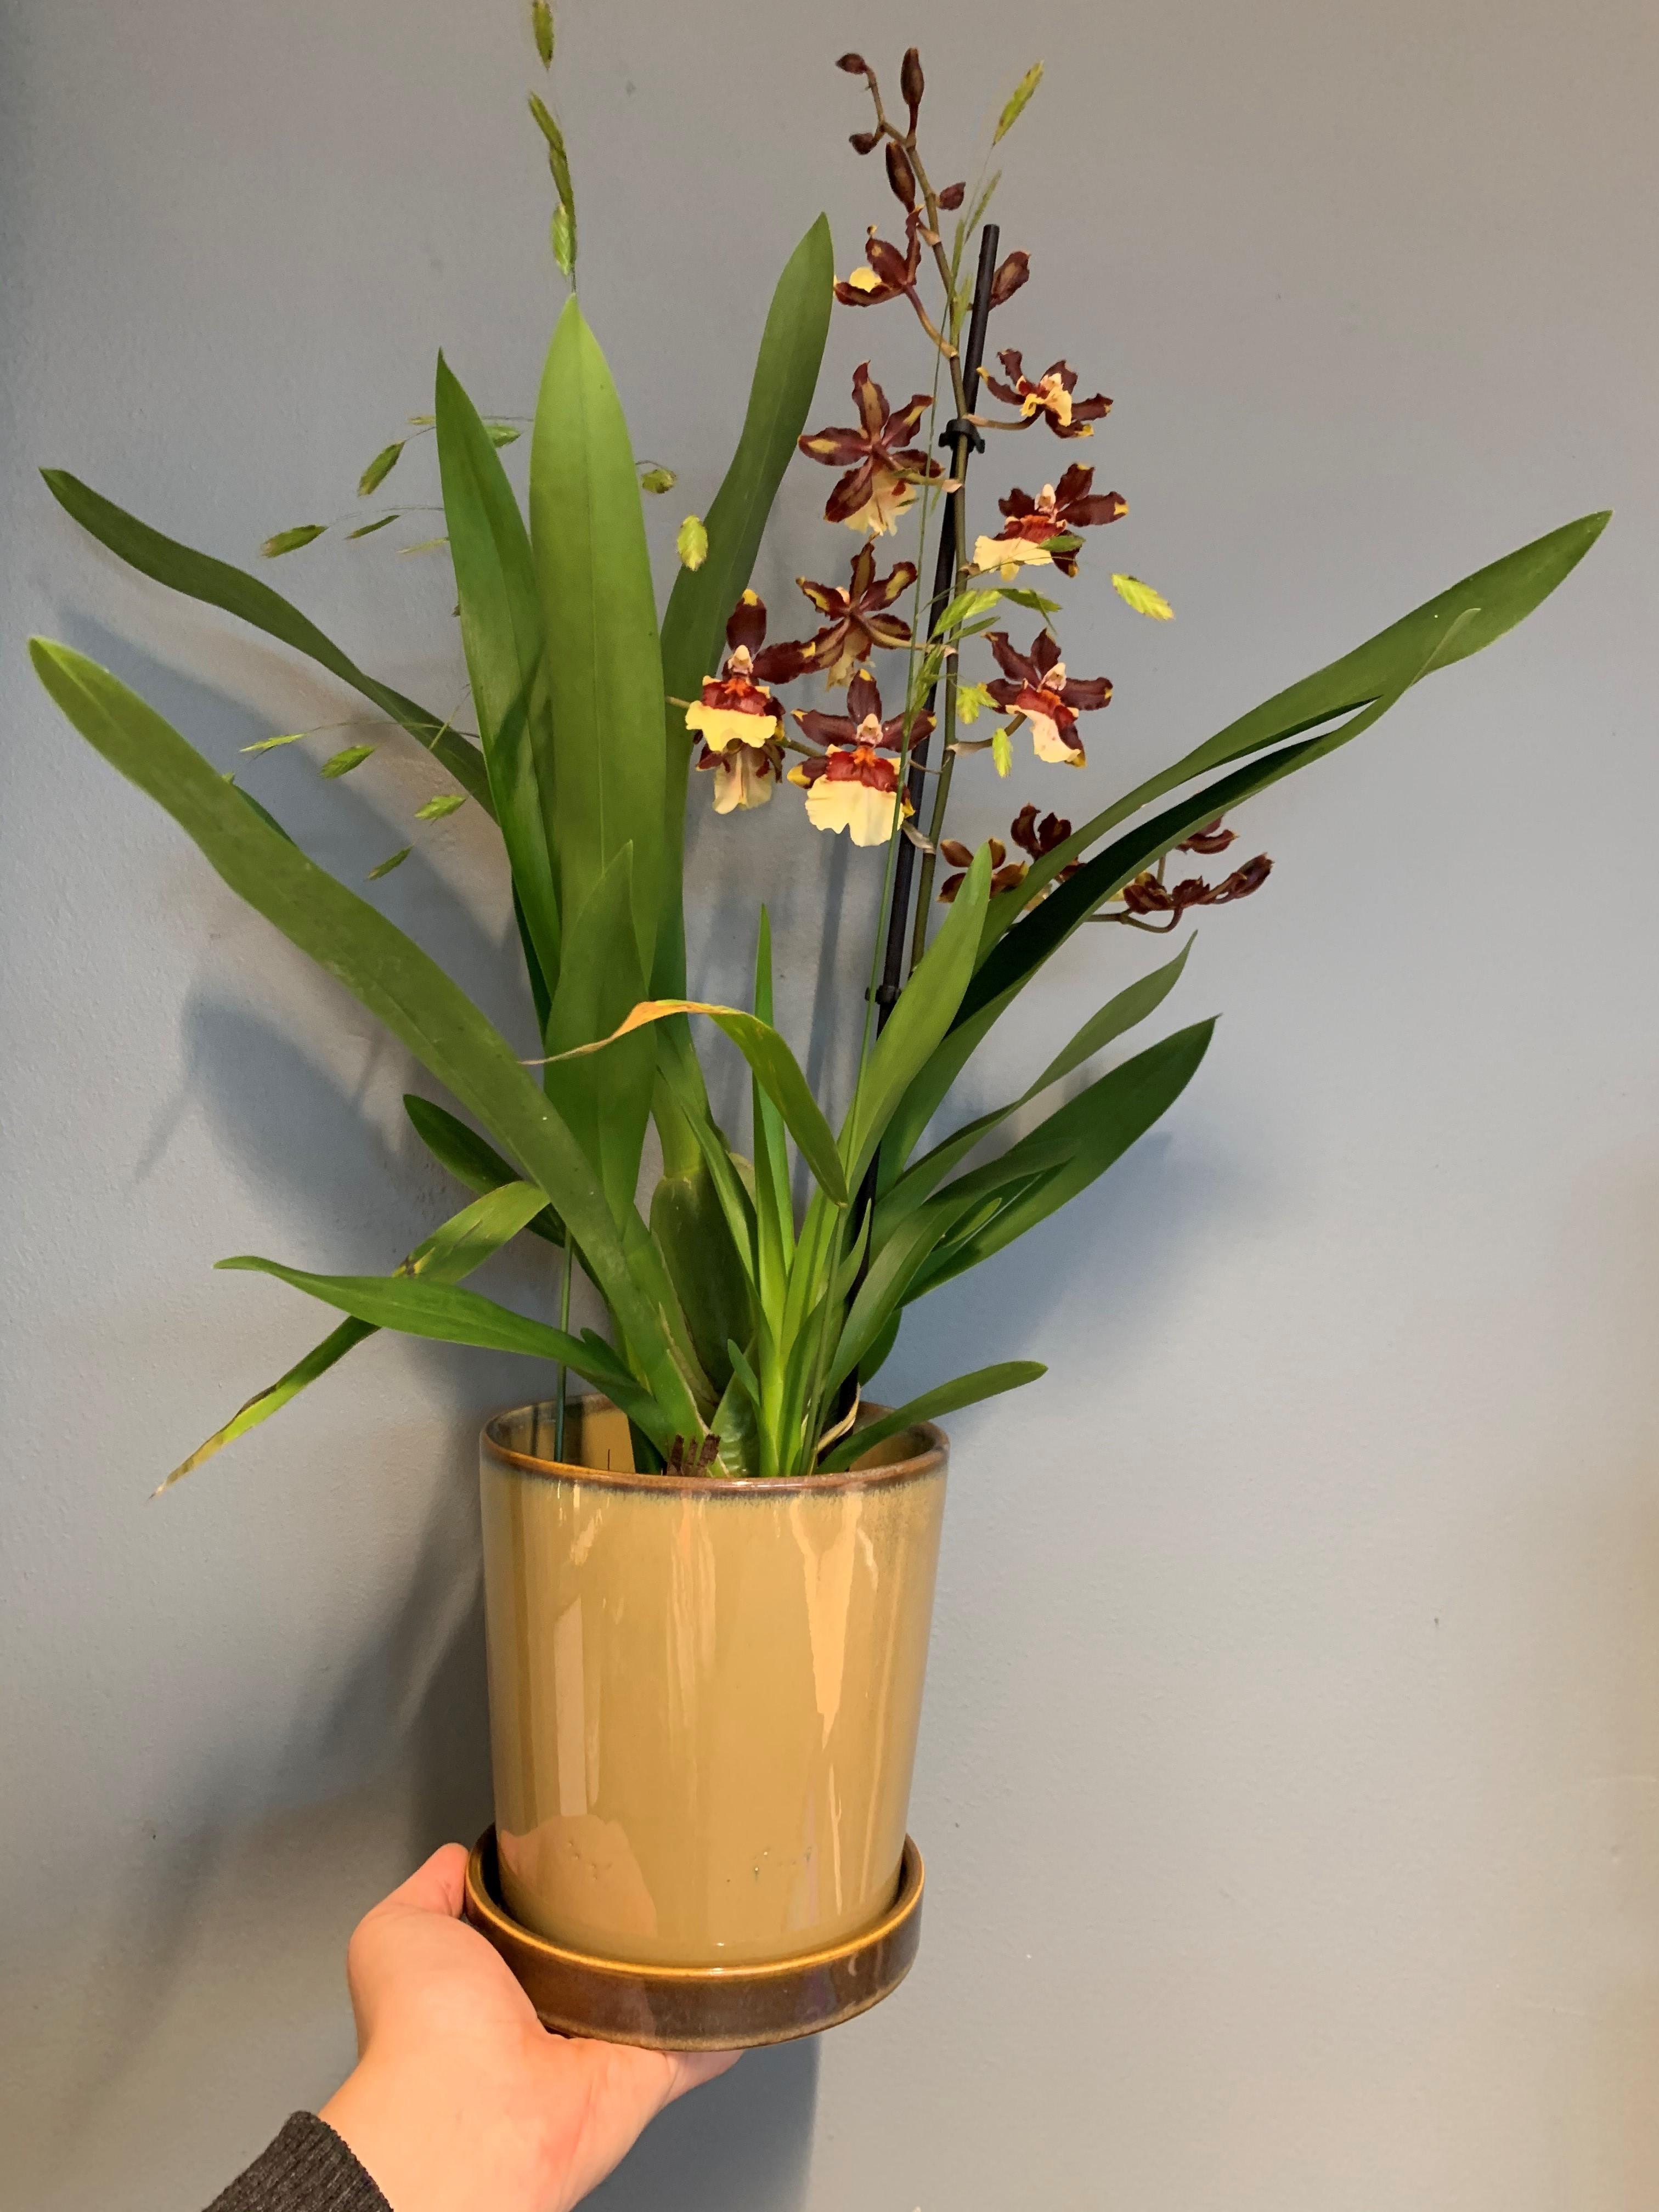 Blommande växt i matchande kruka